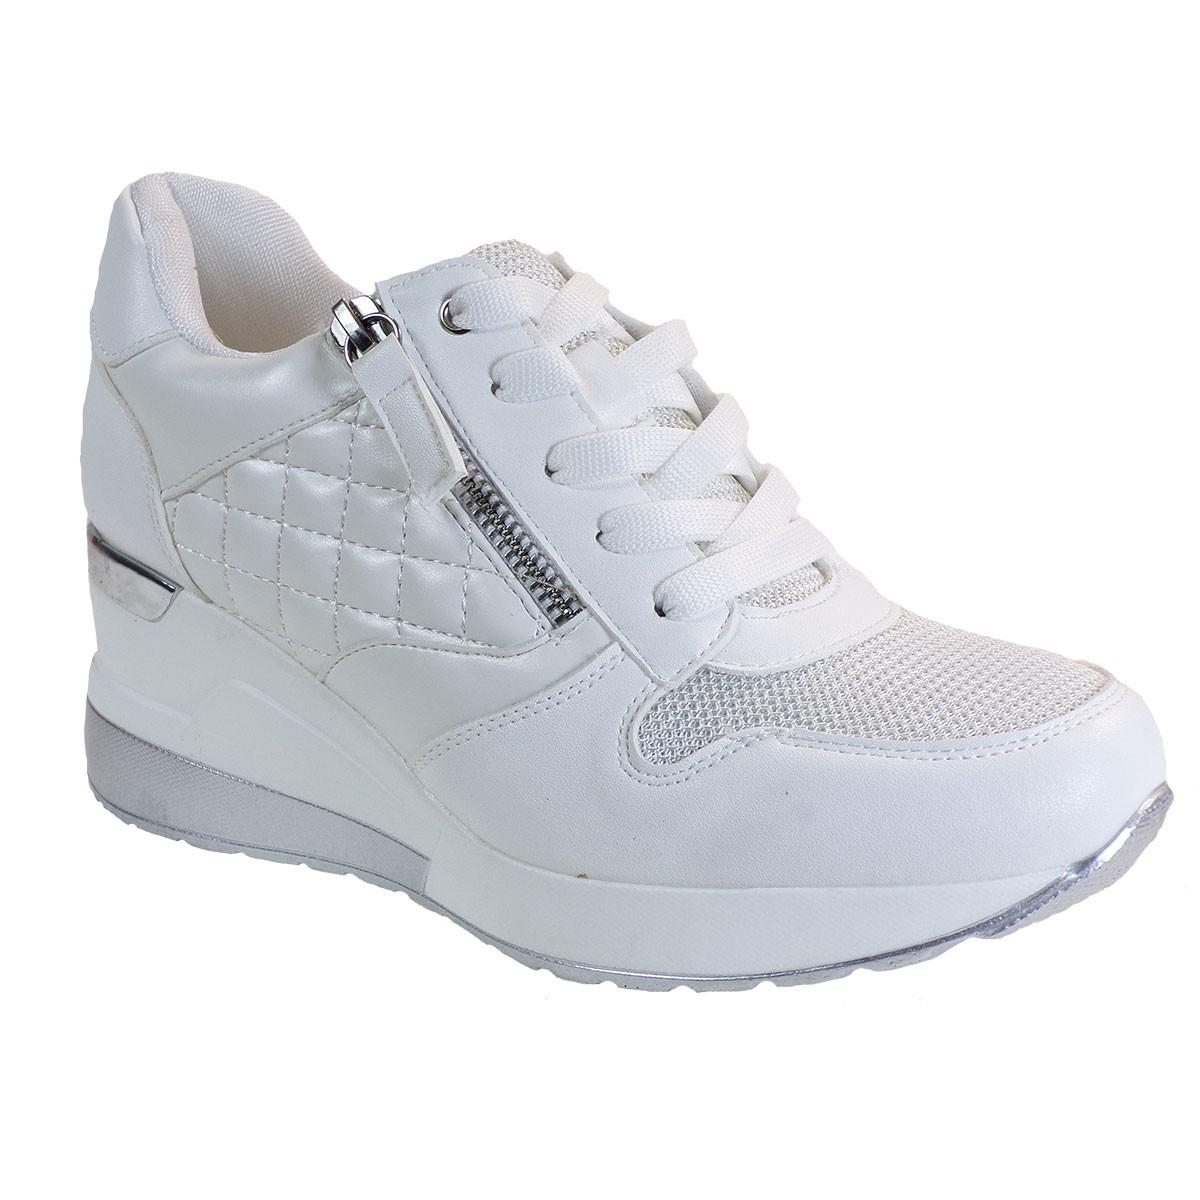 Bagiota Shoes Γυναικεία Παπούτσια Sneakers Αθλητικά H8991 Λευκό